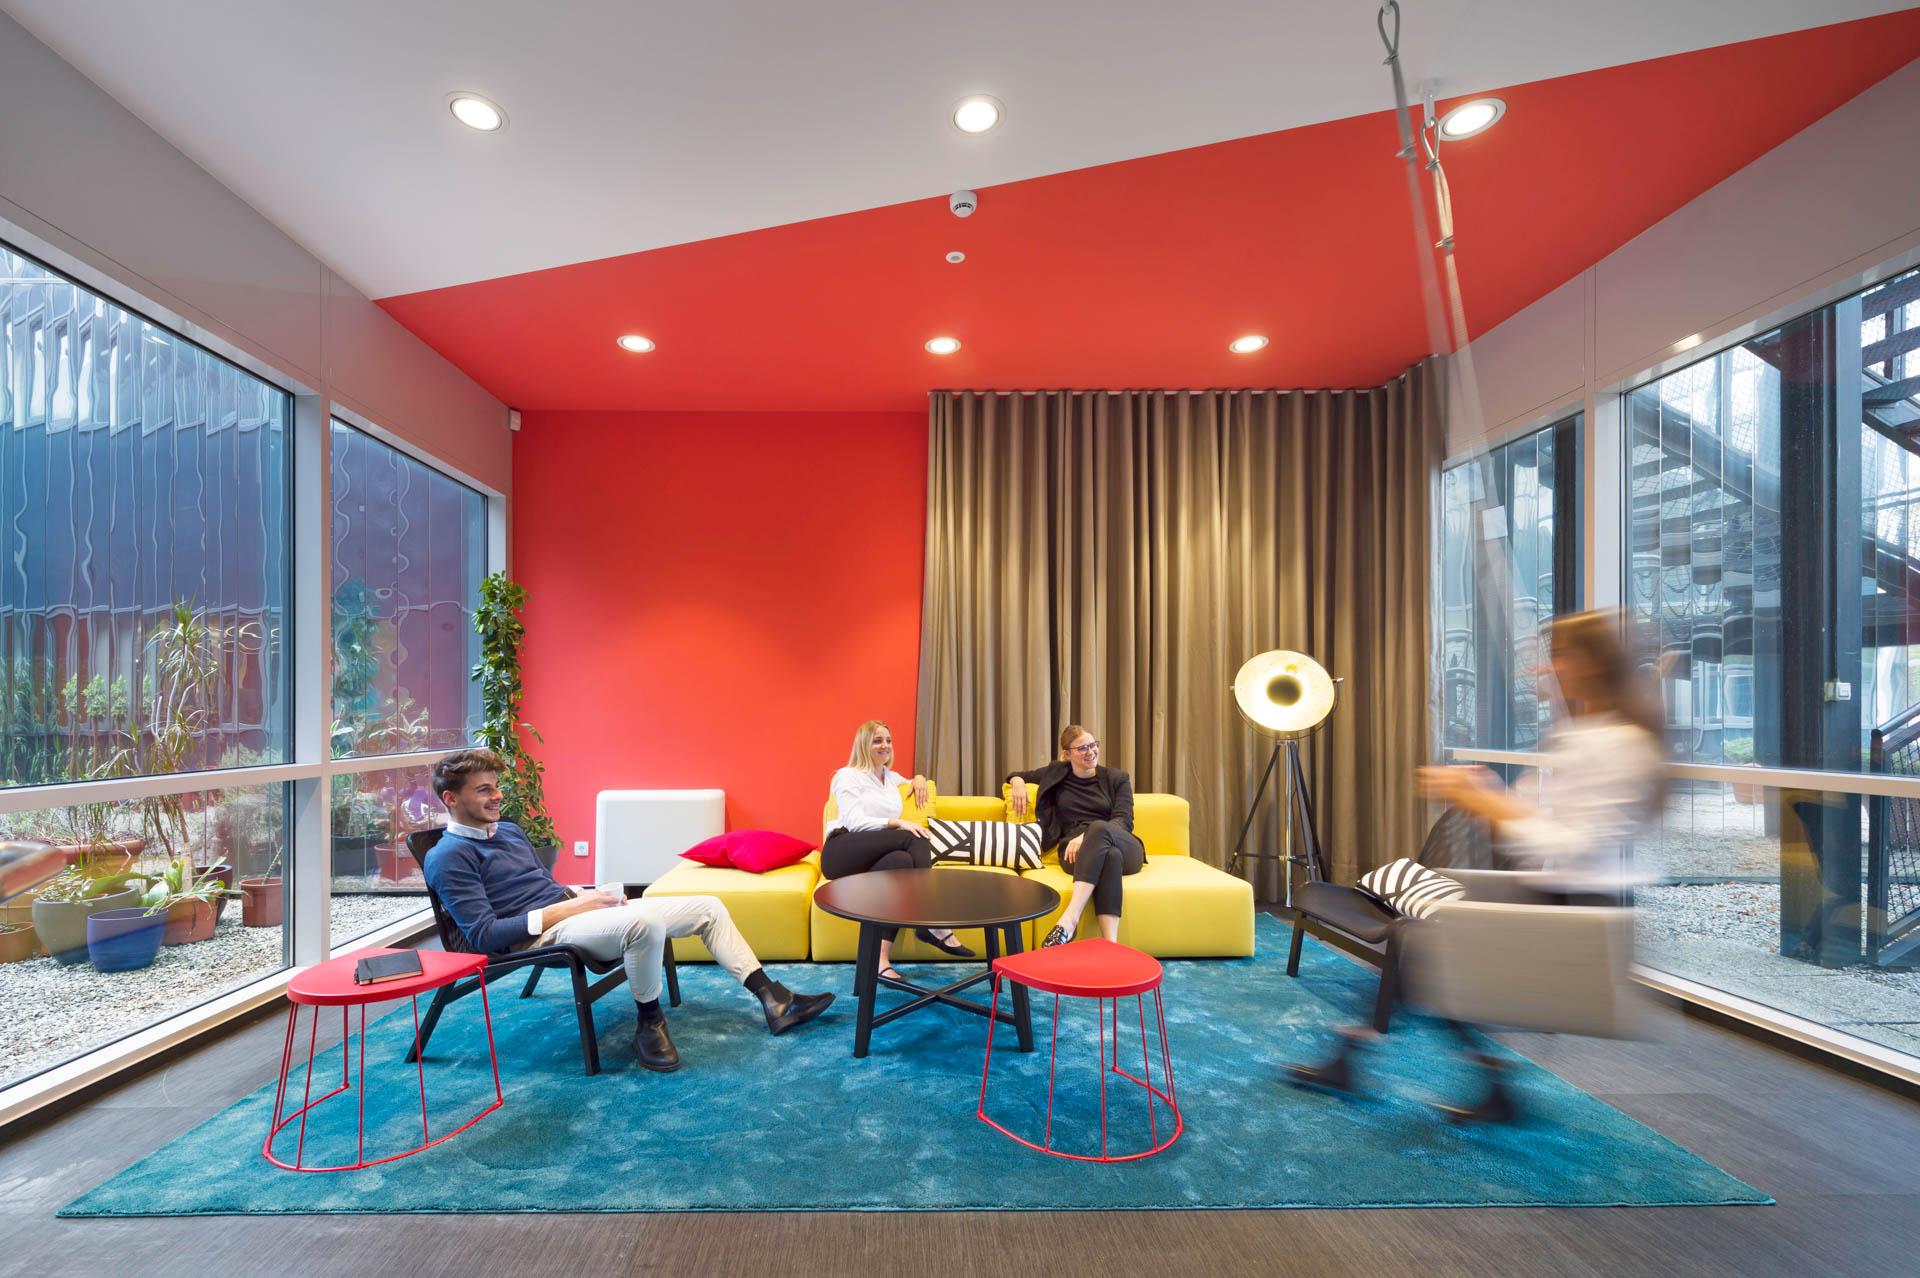 Krageljarchitects - BSH Living Office (9)